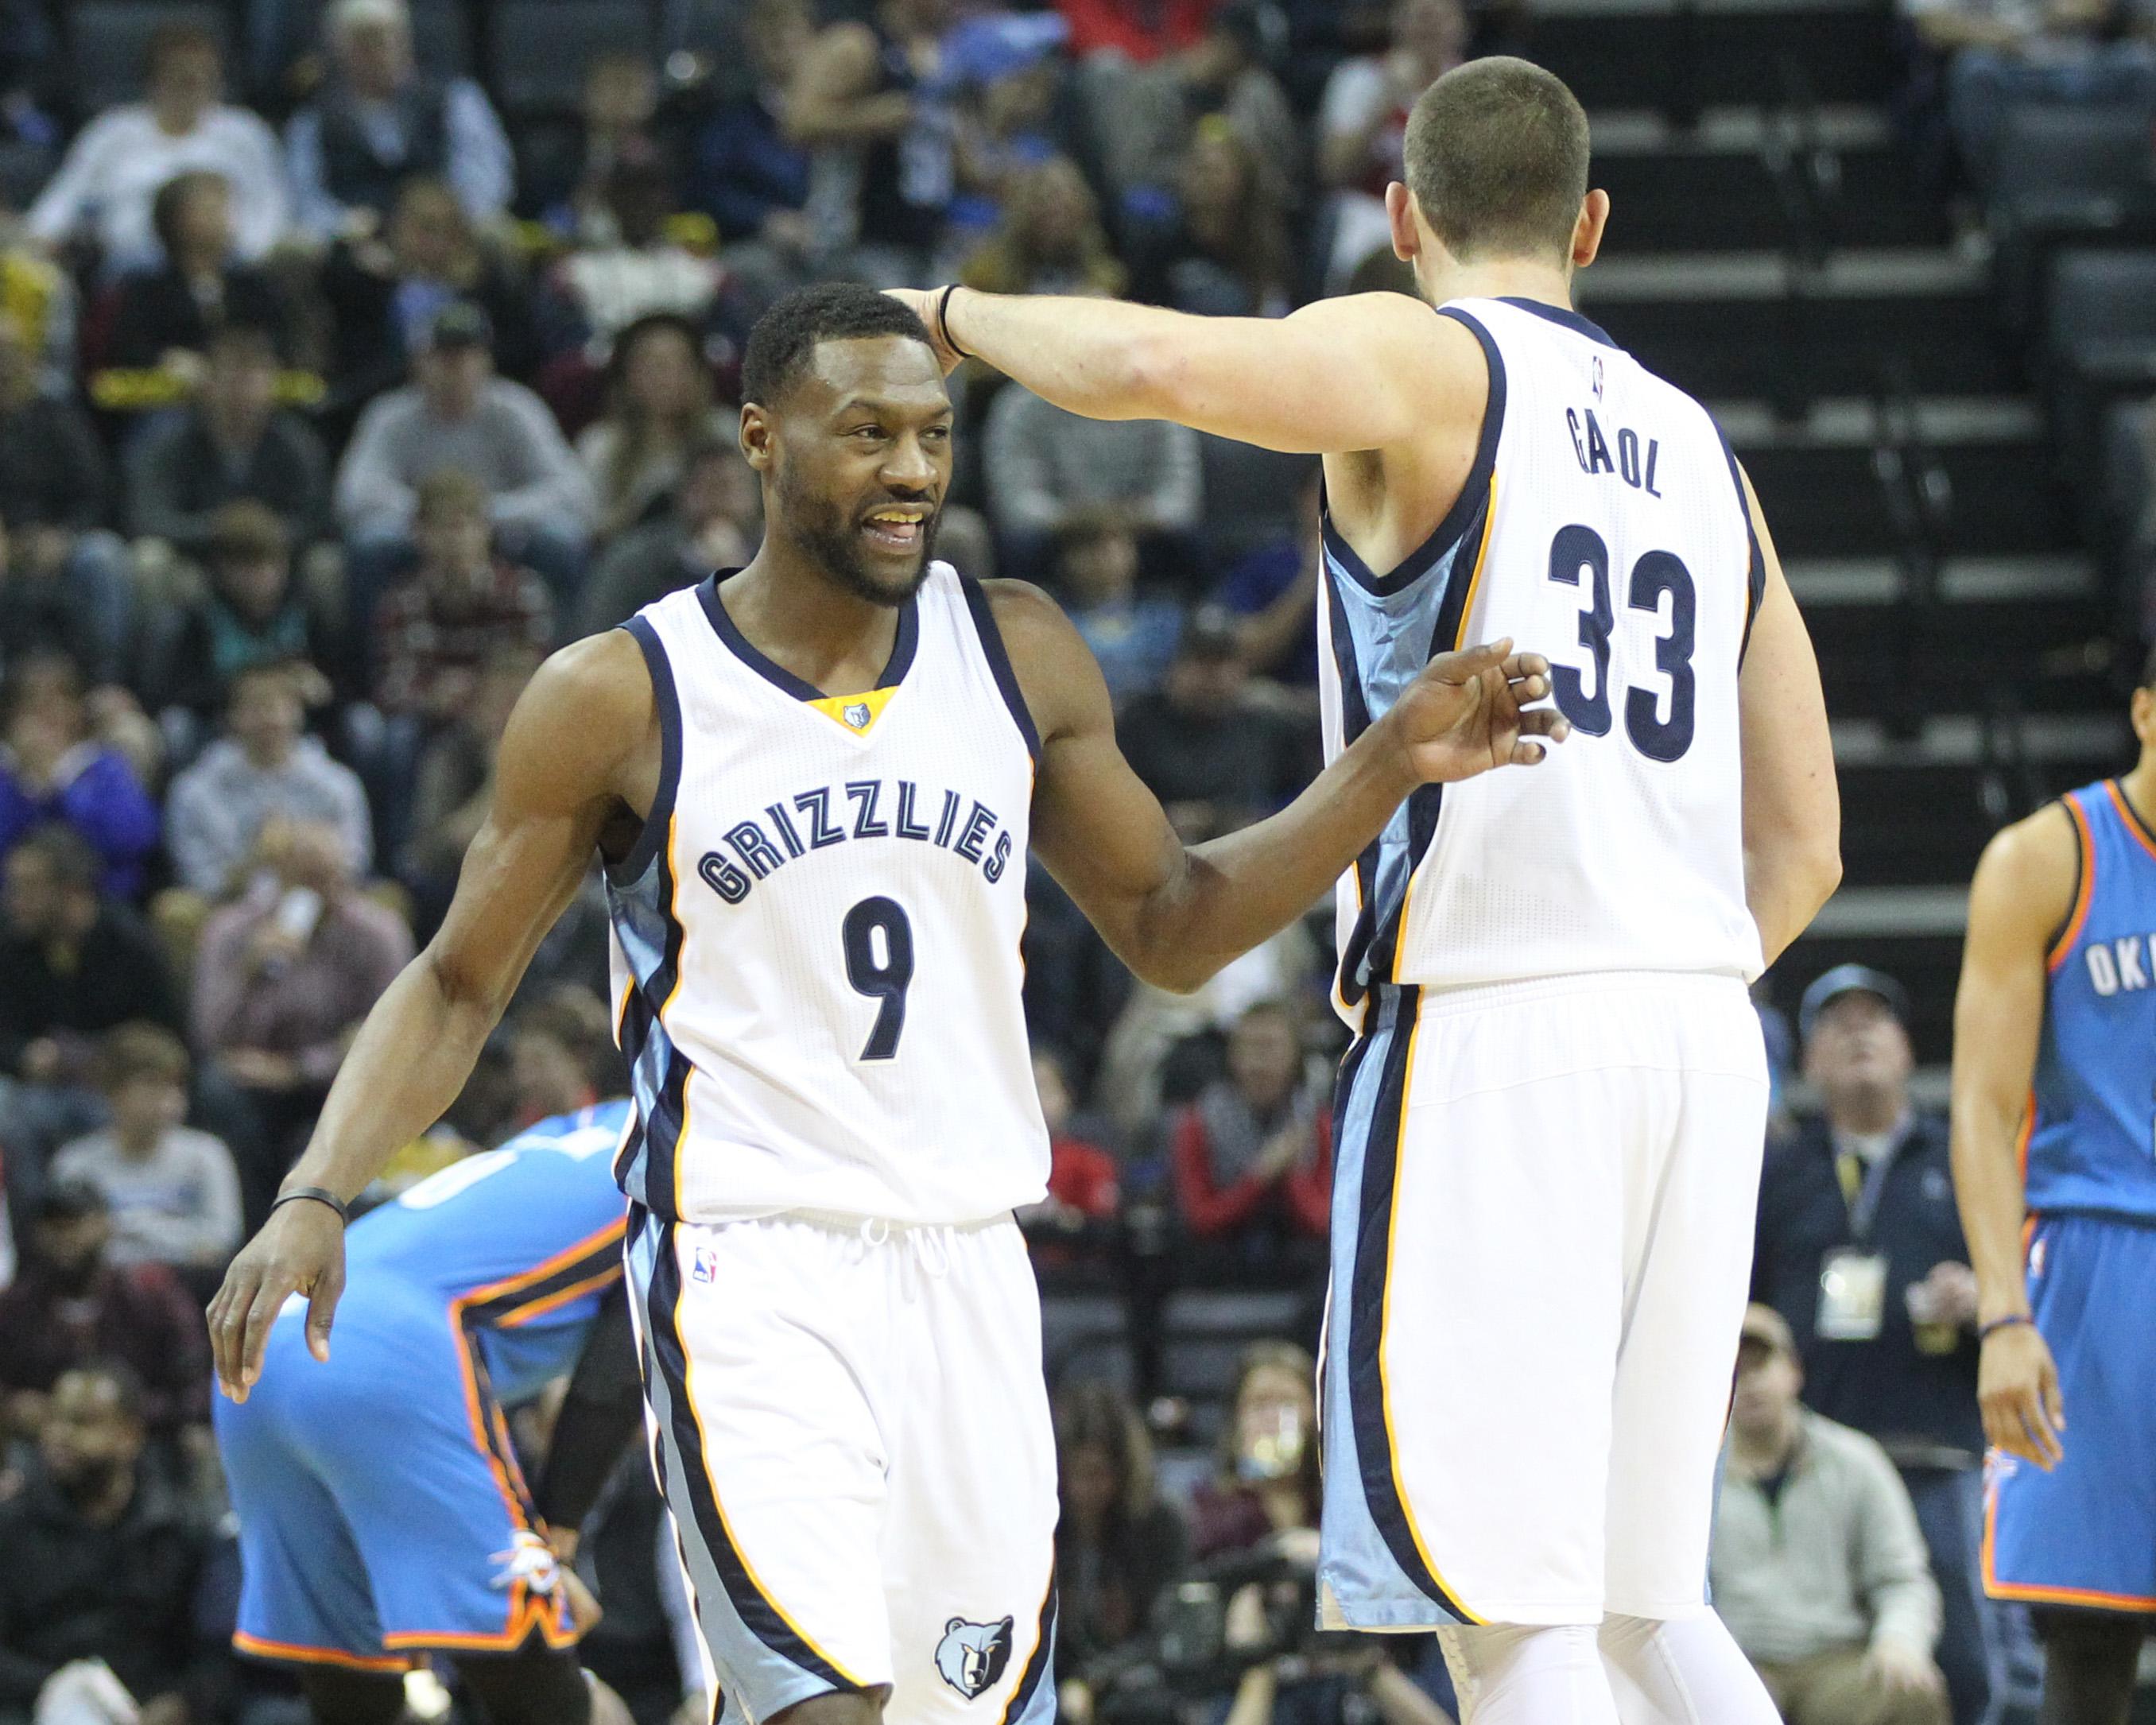 NBA: Oklahoma City Thunder at Memphis Grizzlies